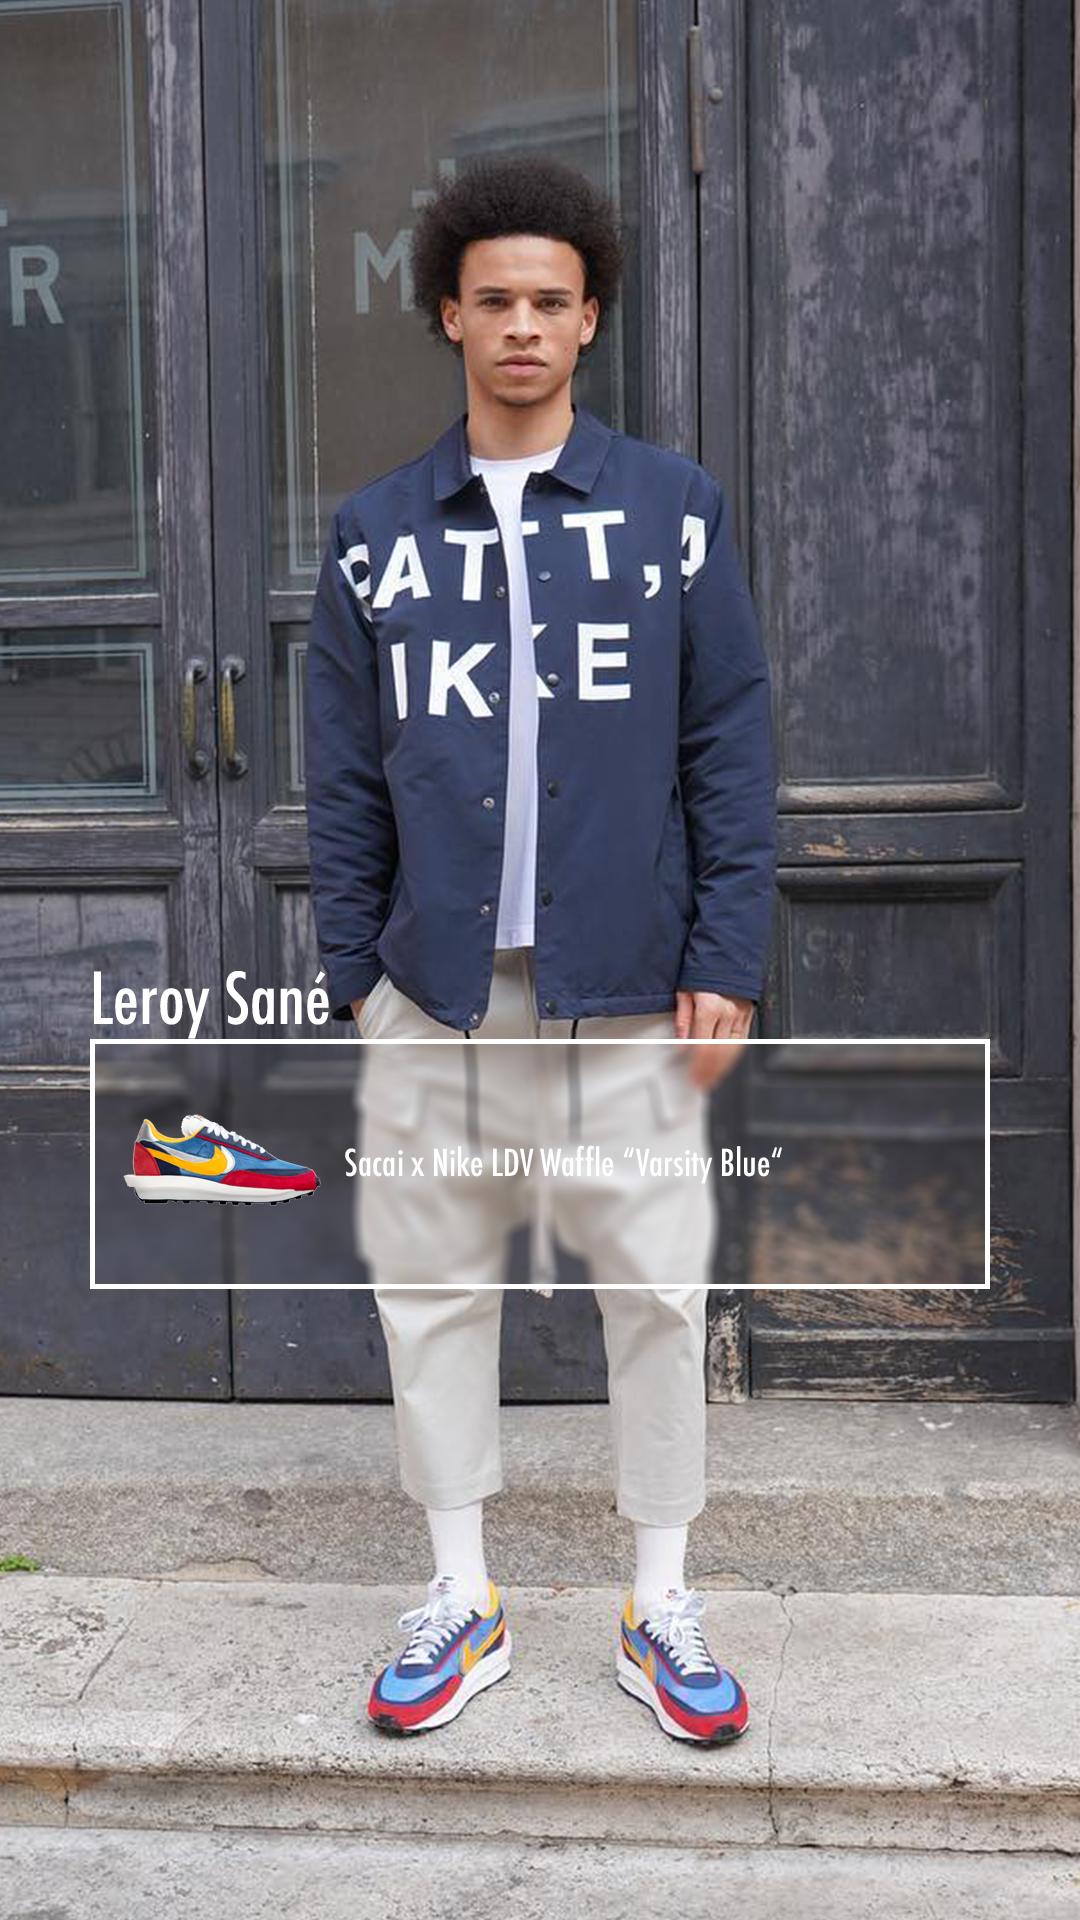 Leroy Sane Sacai X Nike Ldwaffle Varsity Blue Mens Casual Outfits Men Casual Hip Hop Outfits